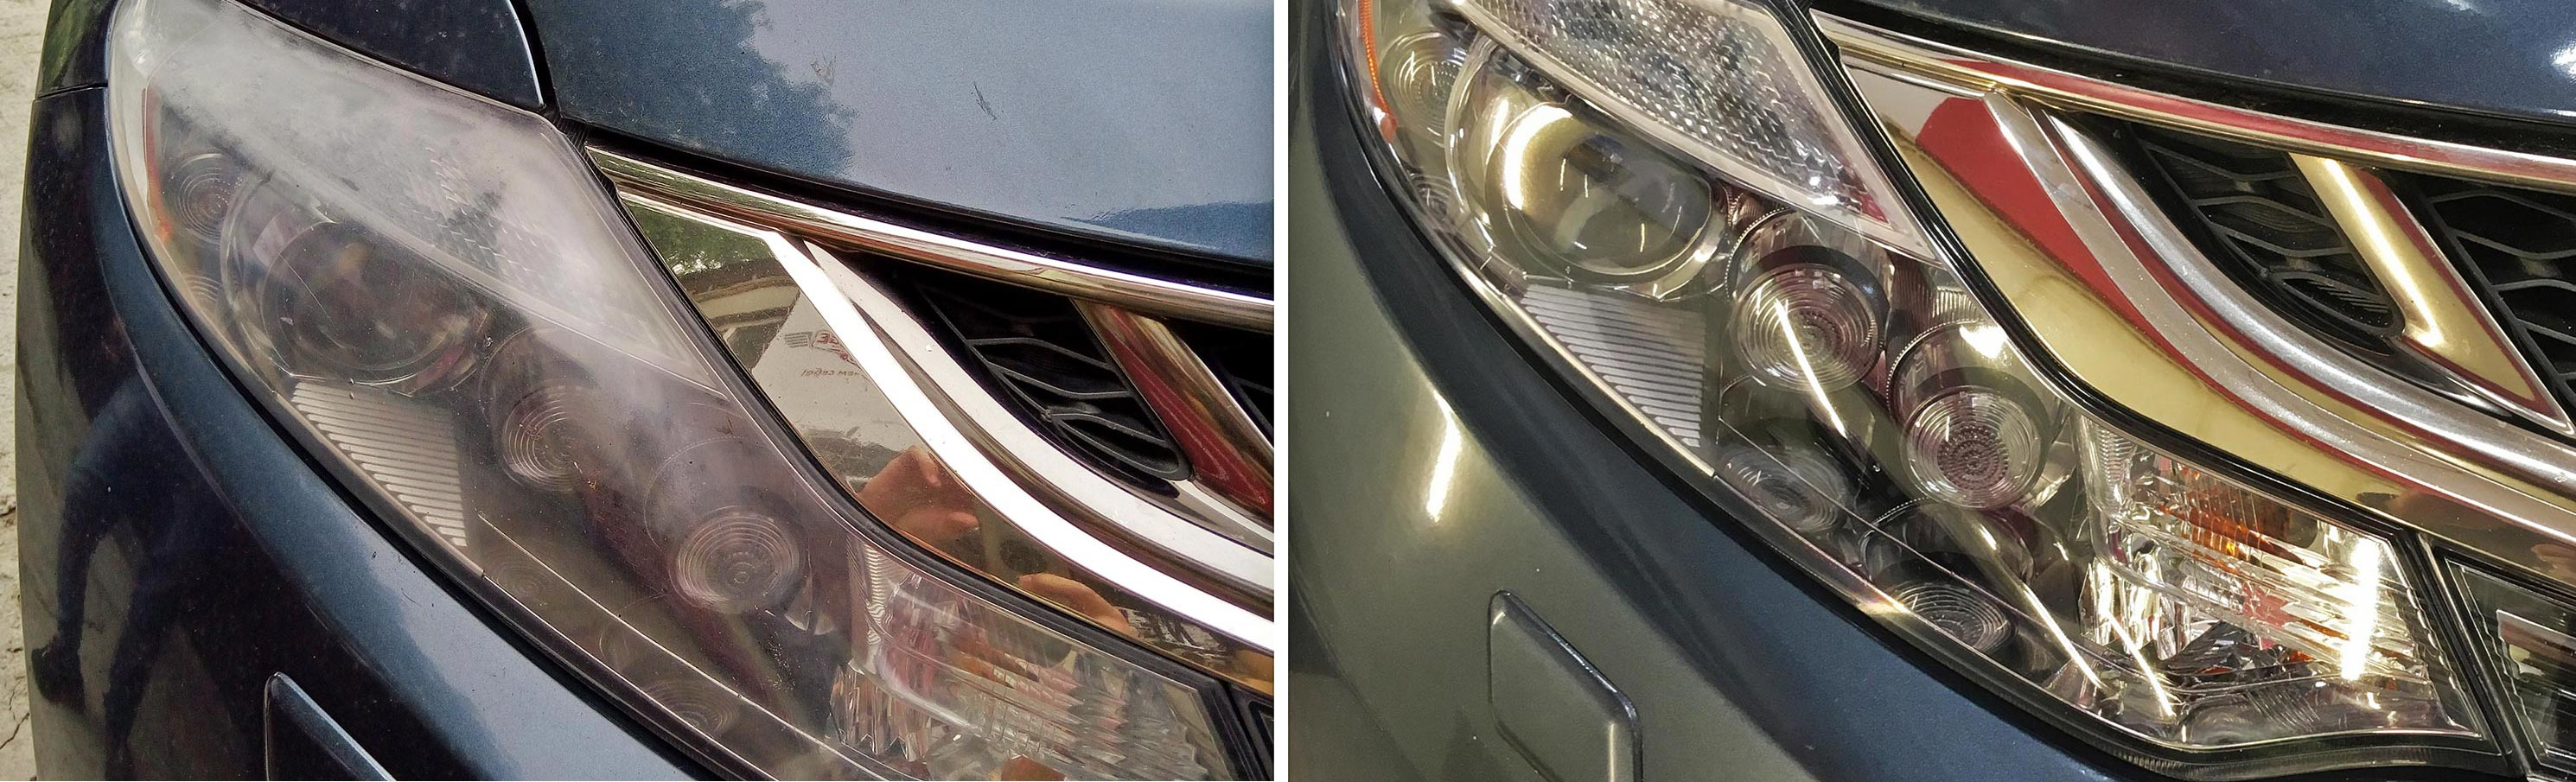 На фото фары до и после полировки. Разница заметна.